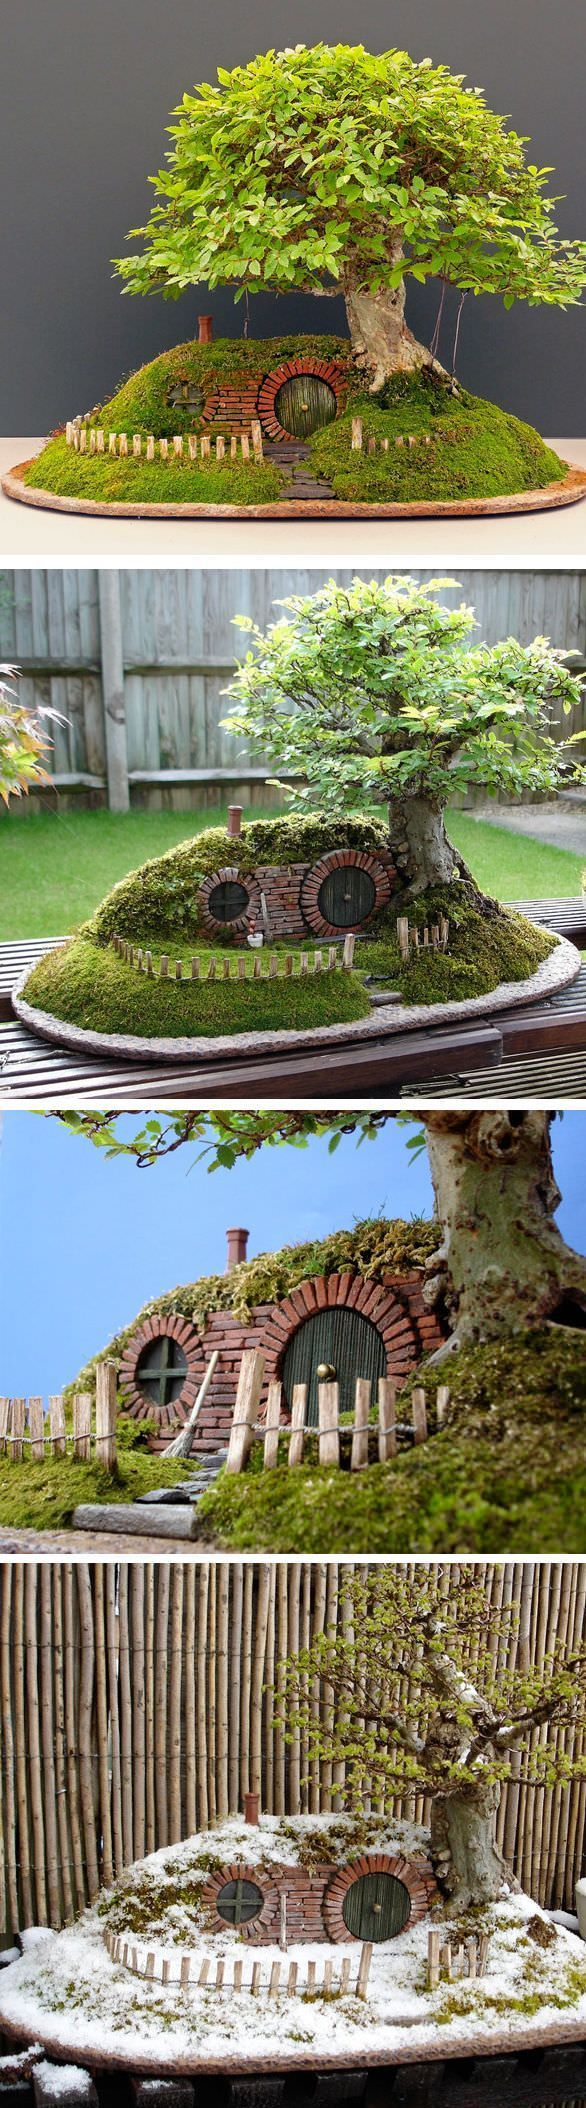 14 Fairy Garden Ideas For Kids At Heart - Hit DIY Crafts